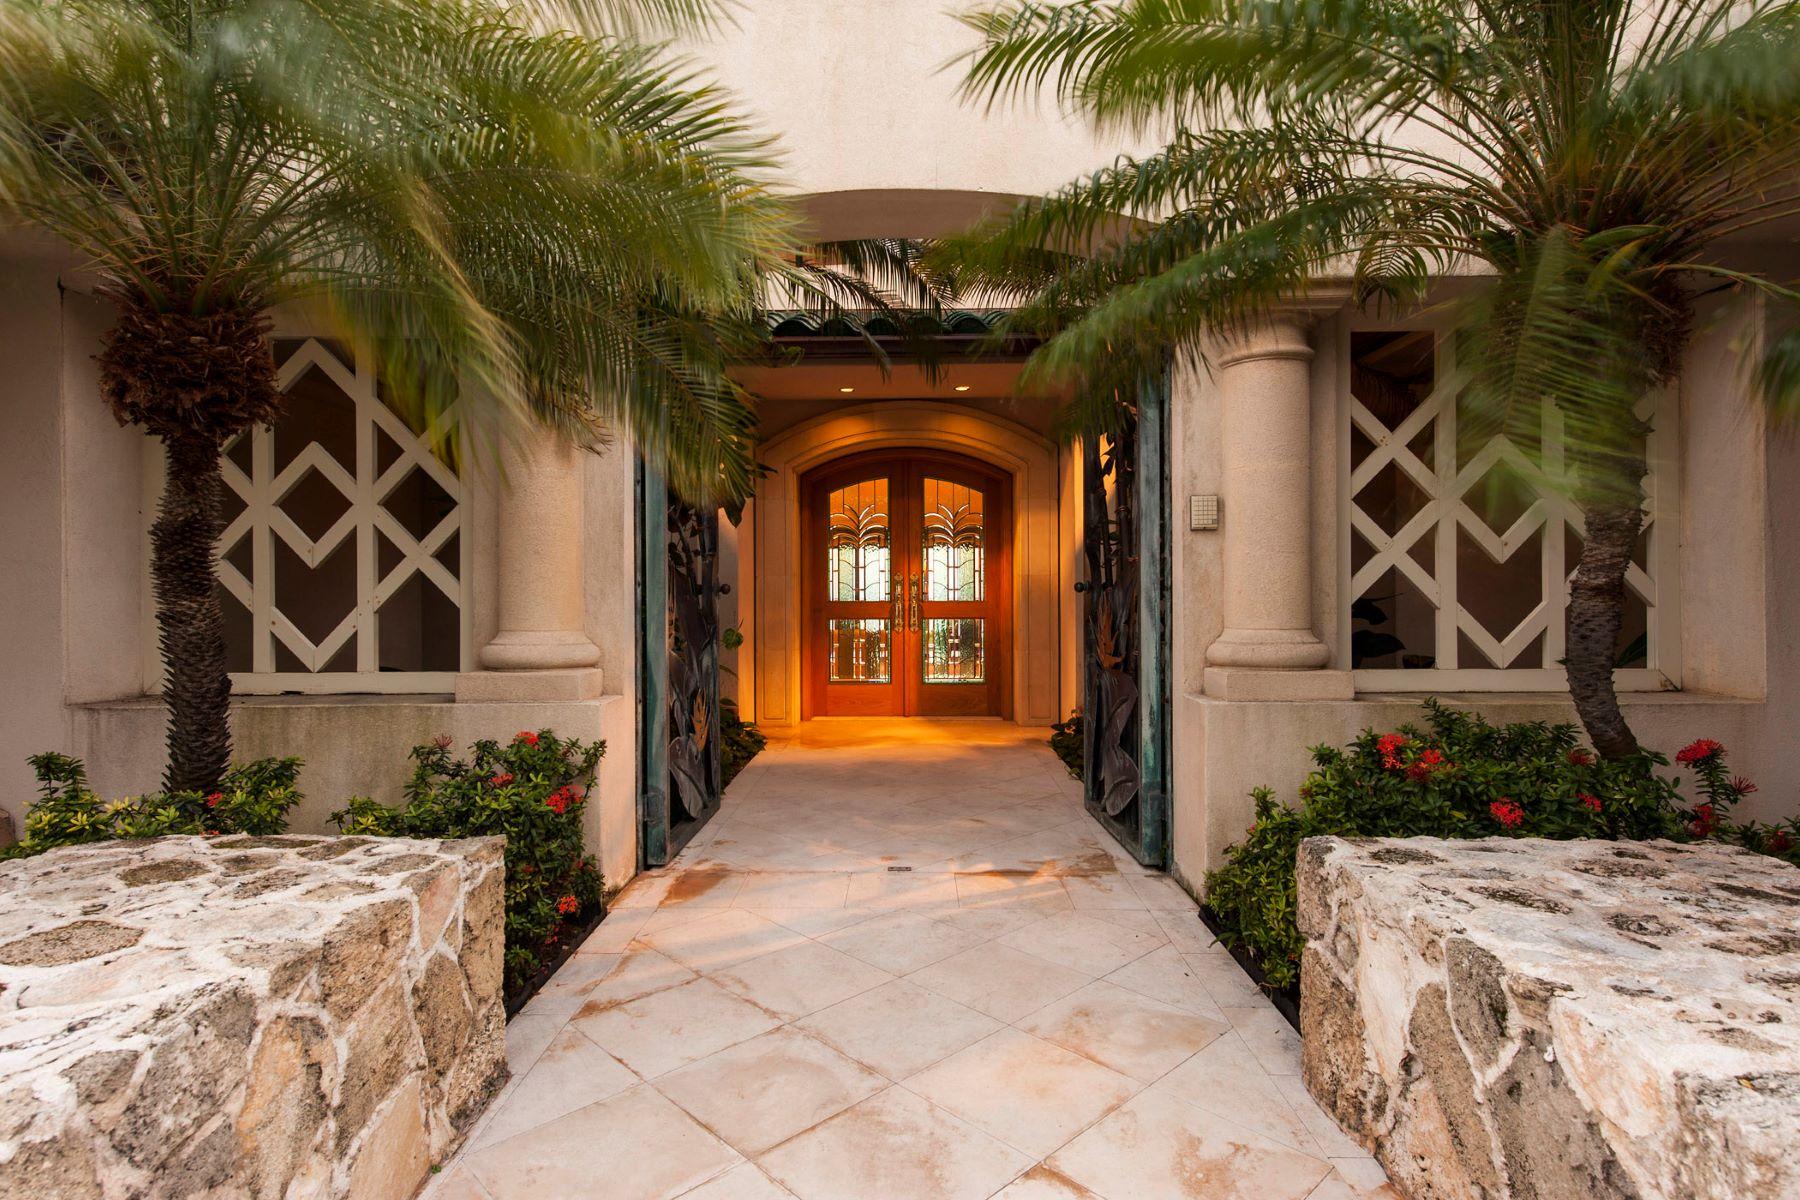 Additional photo for property listing at Grandeur Beachfront Estate 5599 Kalanianaole Highway Honolulu, Hawaii 96821 United States